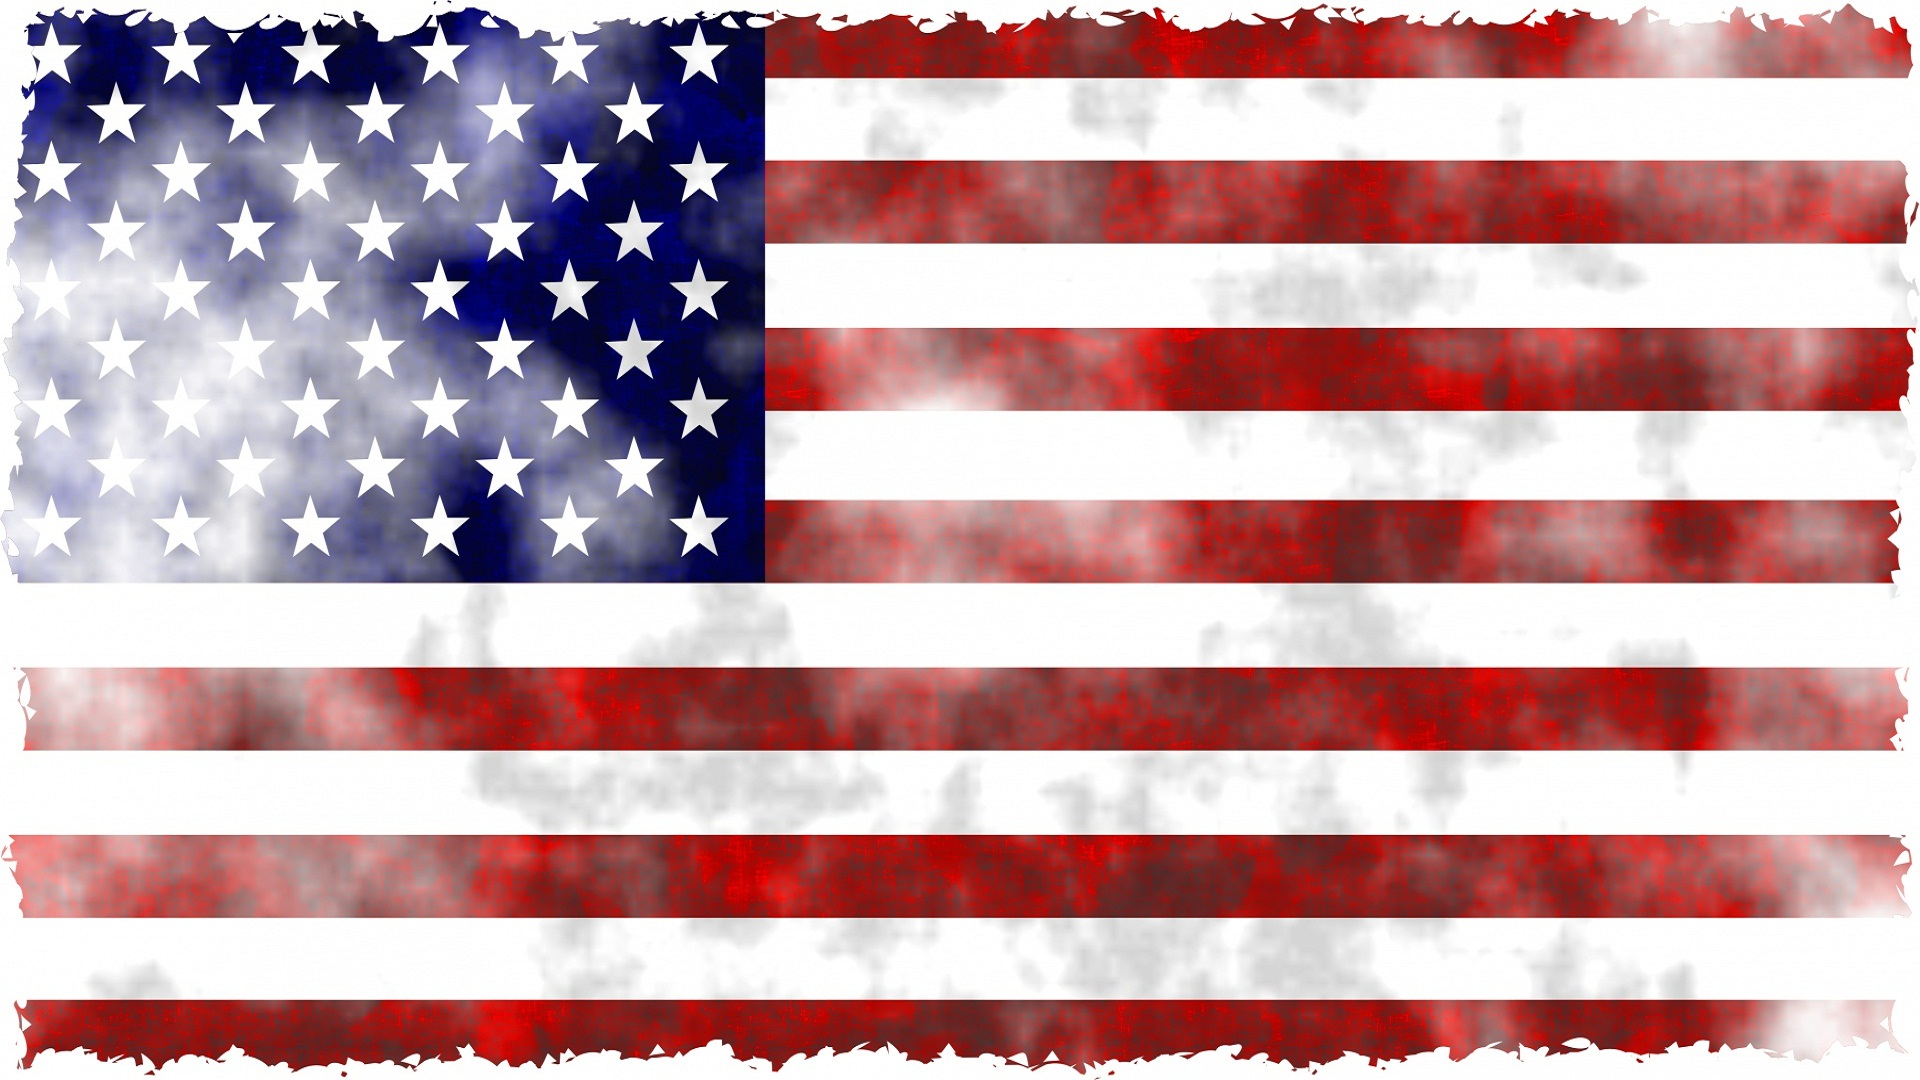 Cute Girly Iphone 6 Wallpaper American Flag Wallpapers Hd Pixelstalk Net